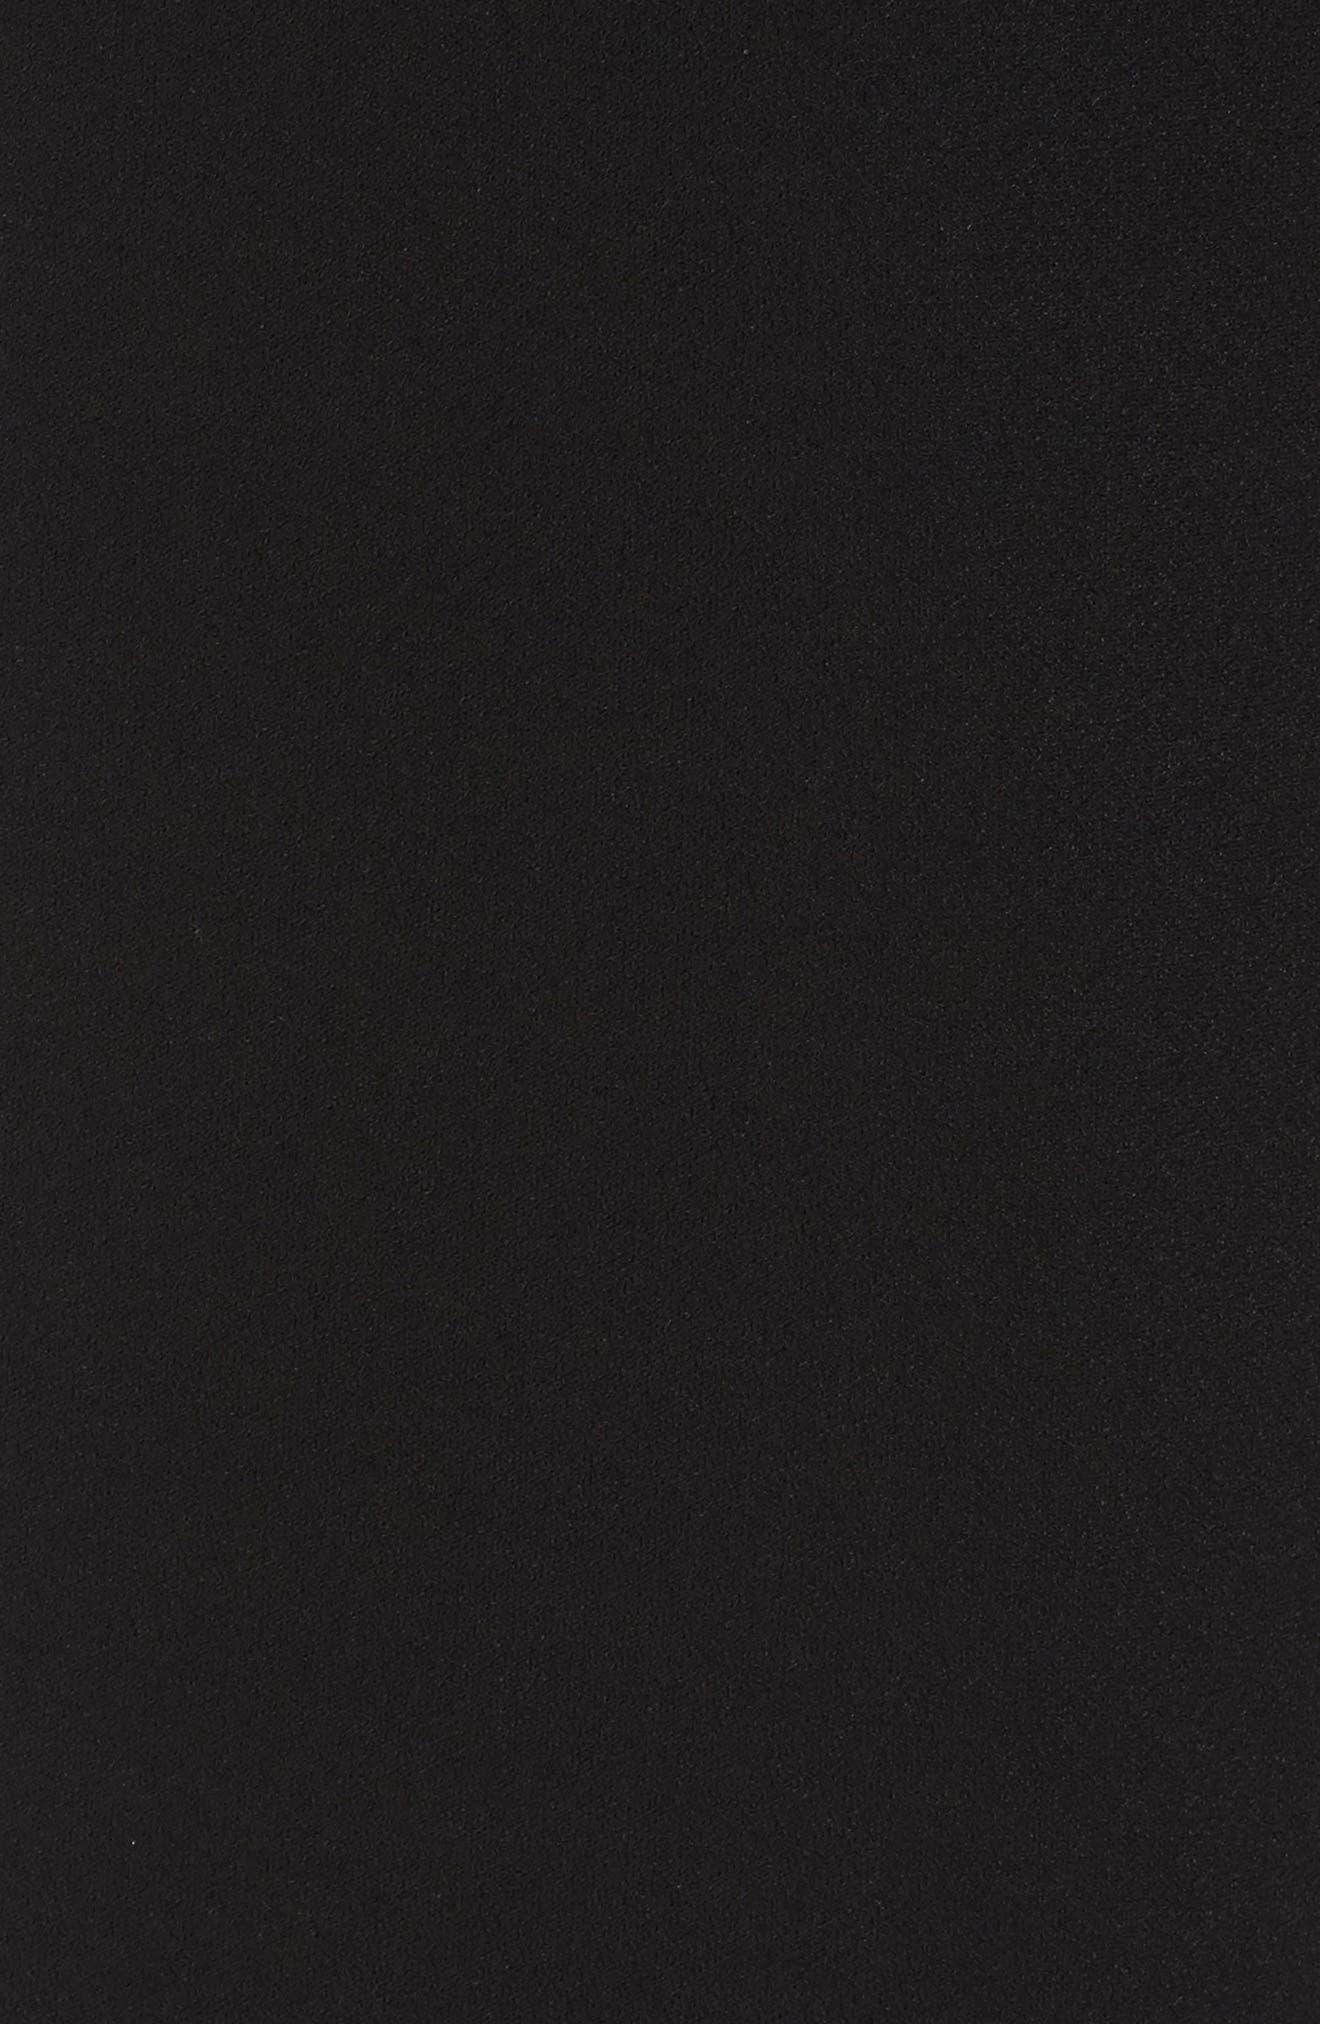 Belted Wide Leg Crop Pants,                             Alternate thumbnail 8, color,                             Black